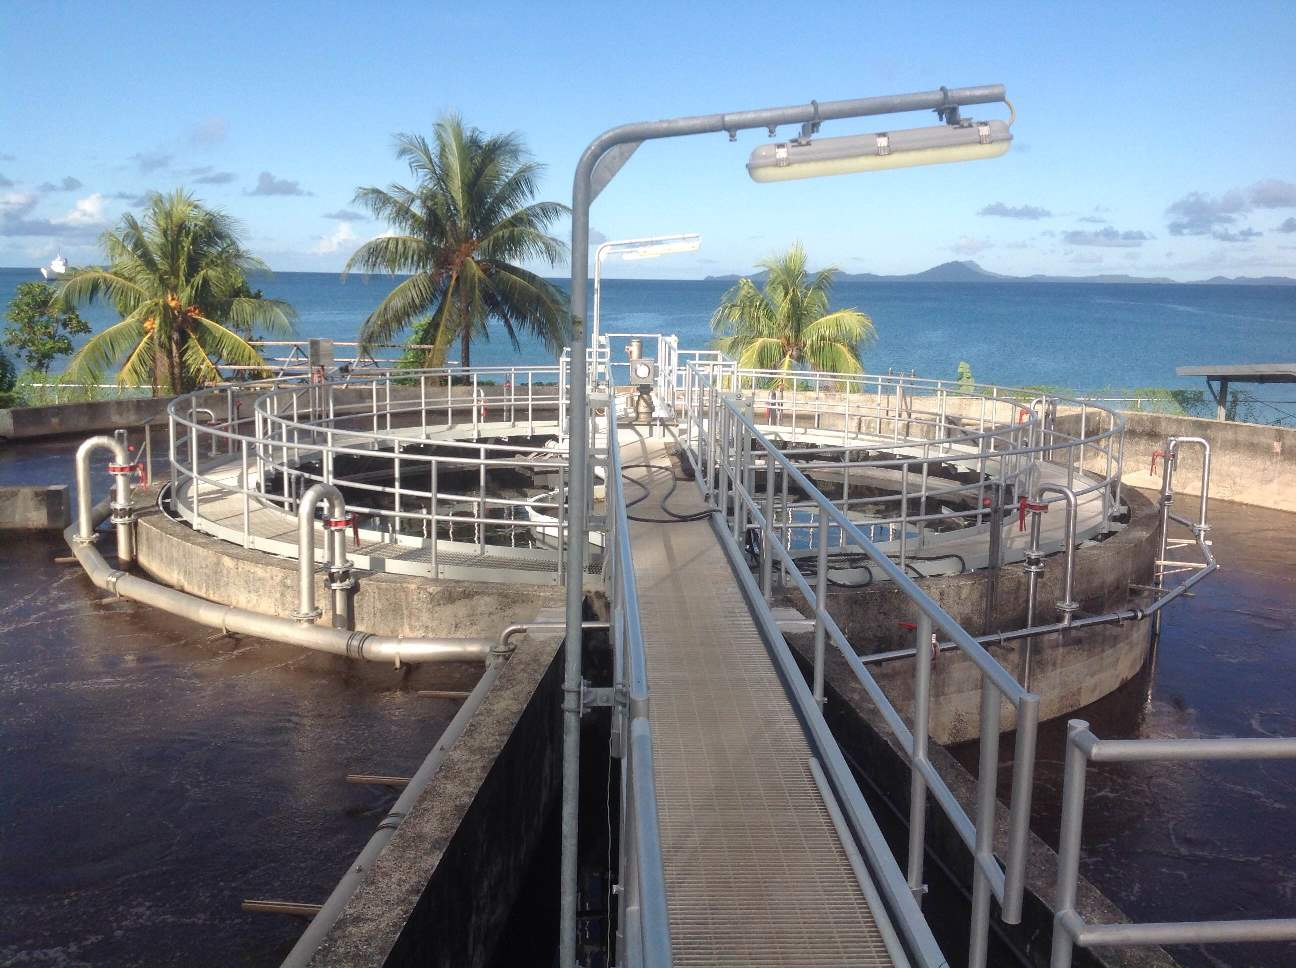 Weno WWTP Upgrade - Activated Sludge and Clarifier Basin Upgrade Complete